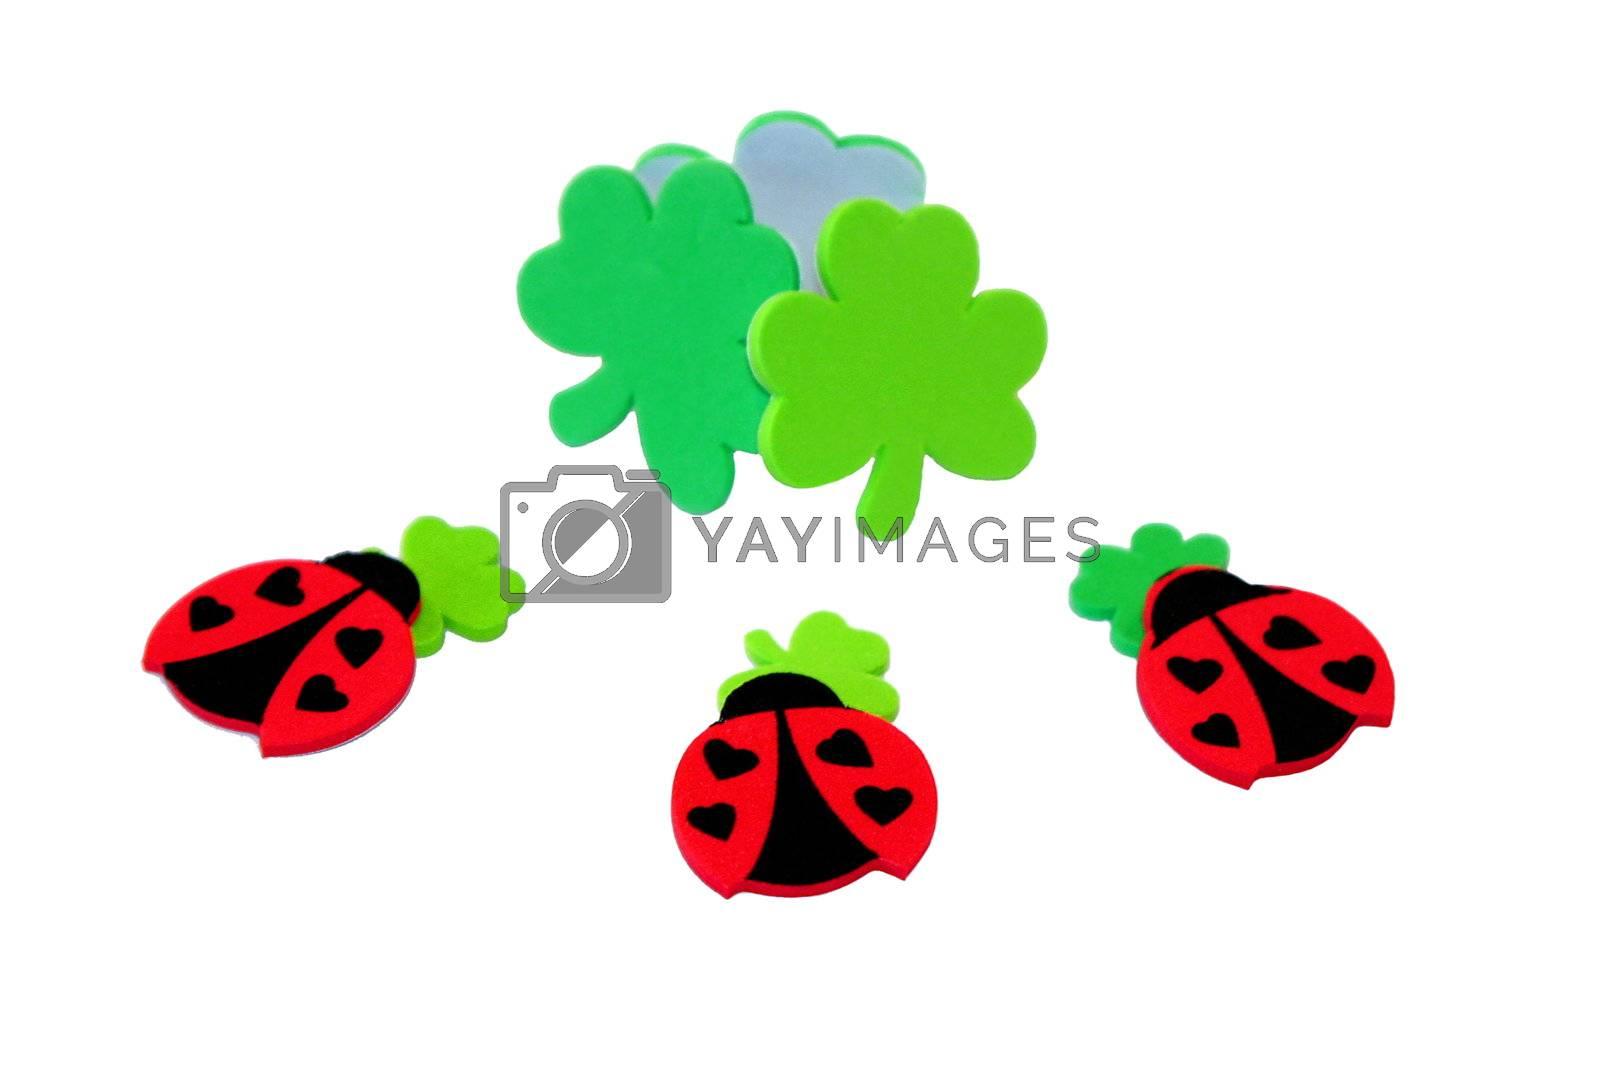 Lucky Ladybugs (6167) by hlehnerer